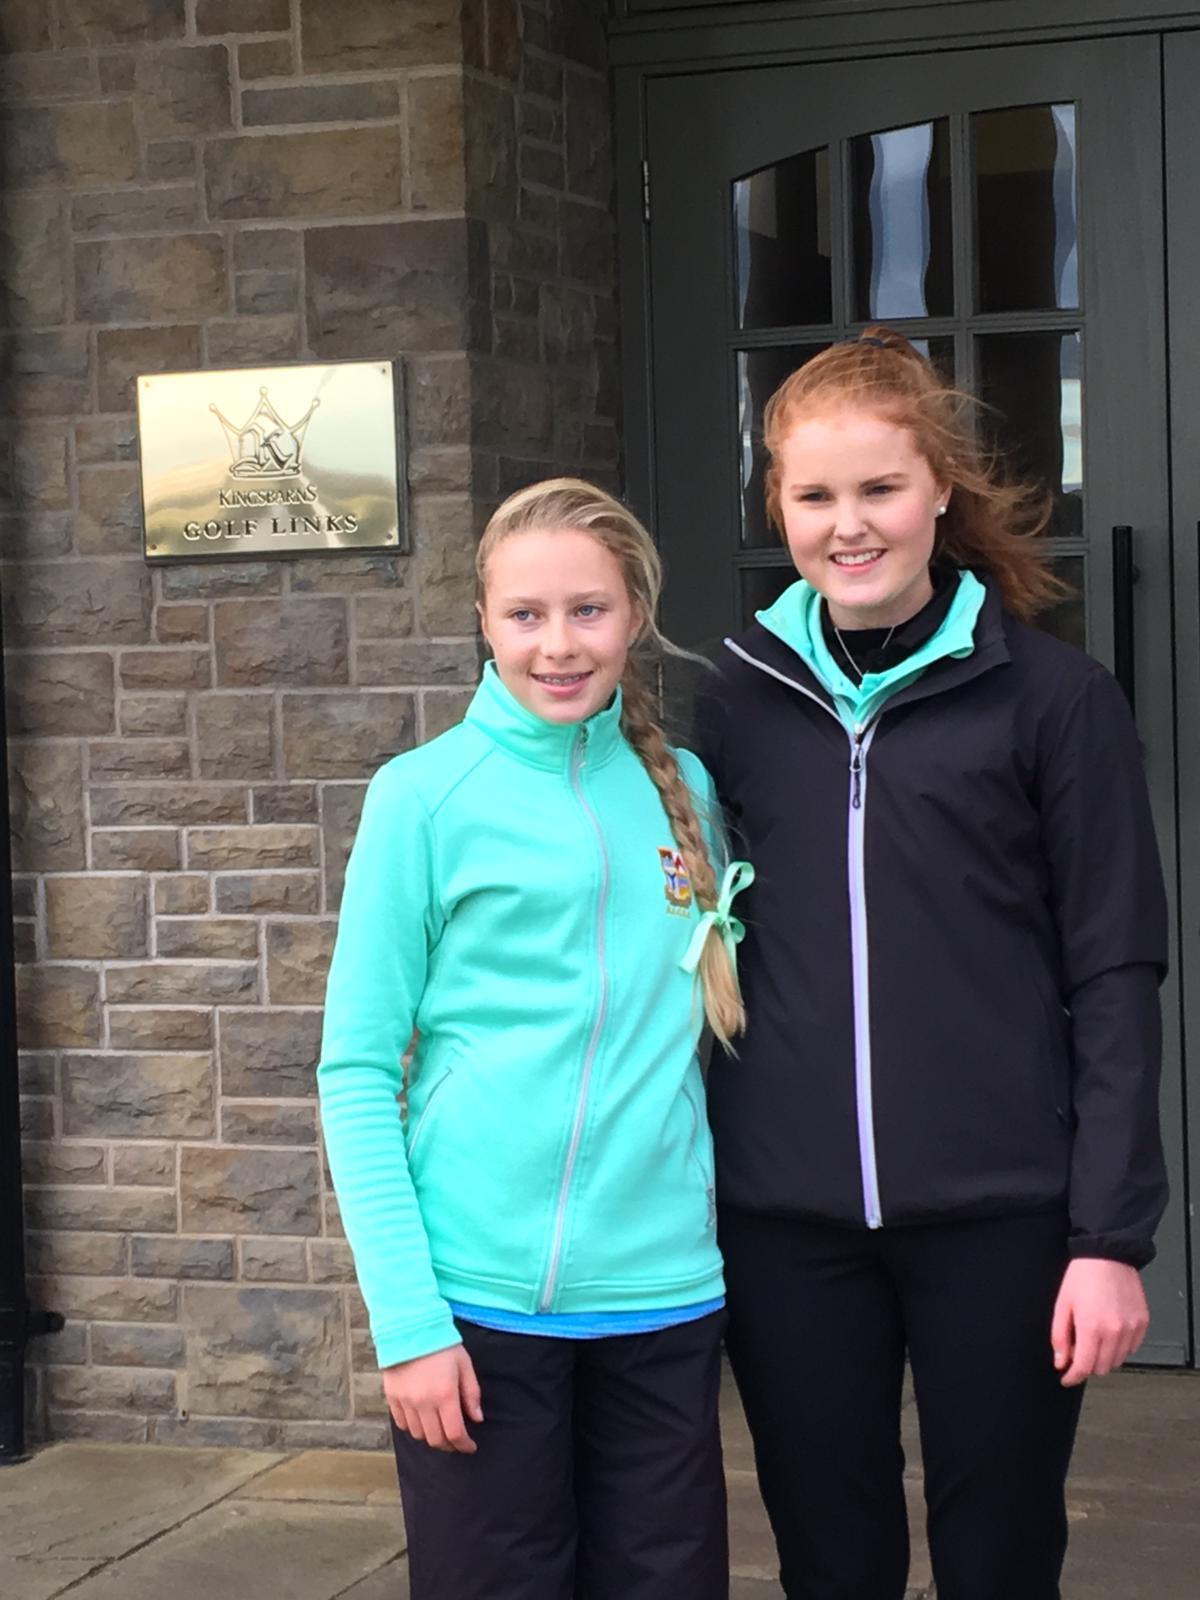 Ayrshire Ladies County Golf Association